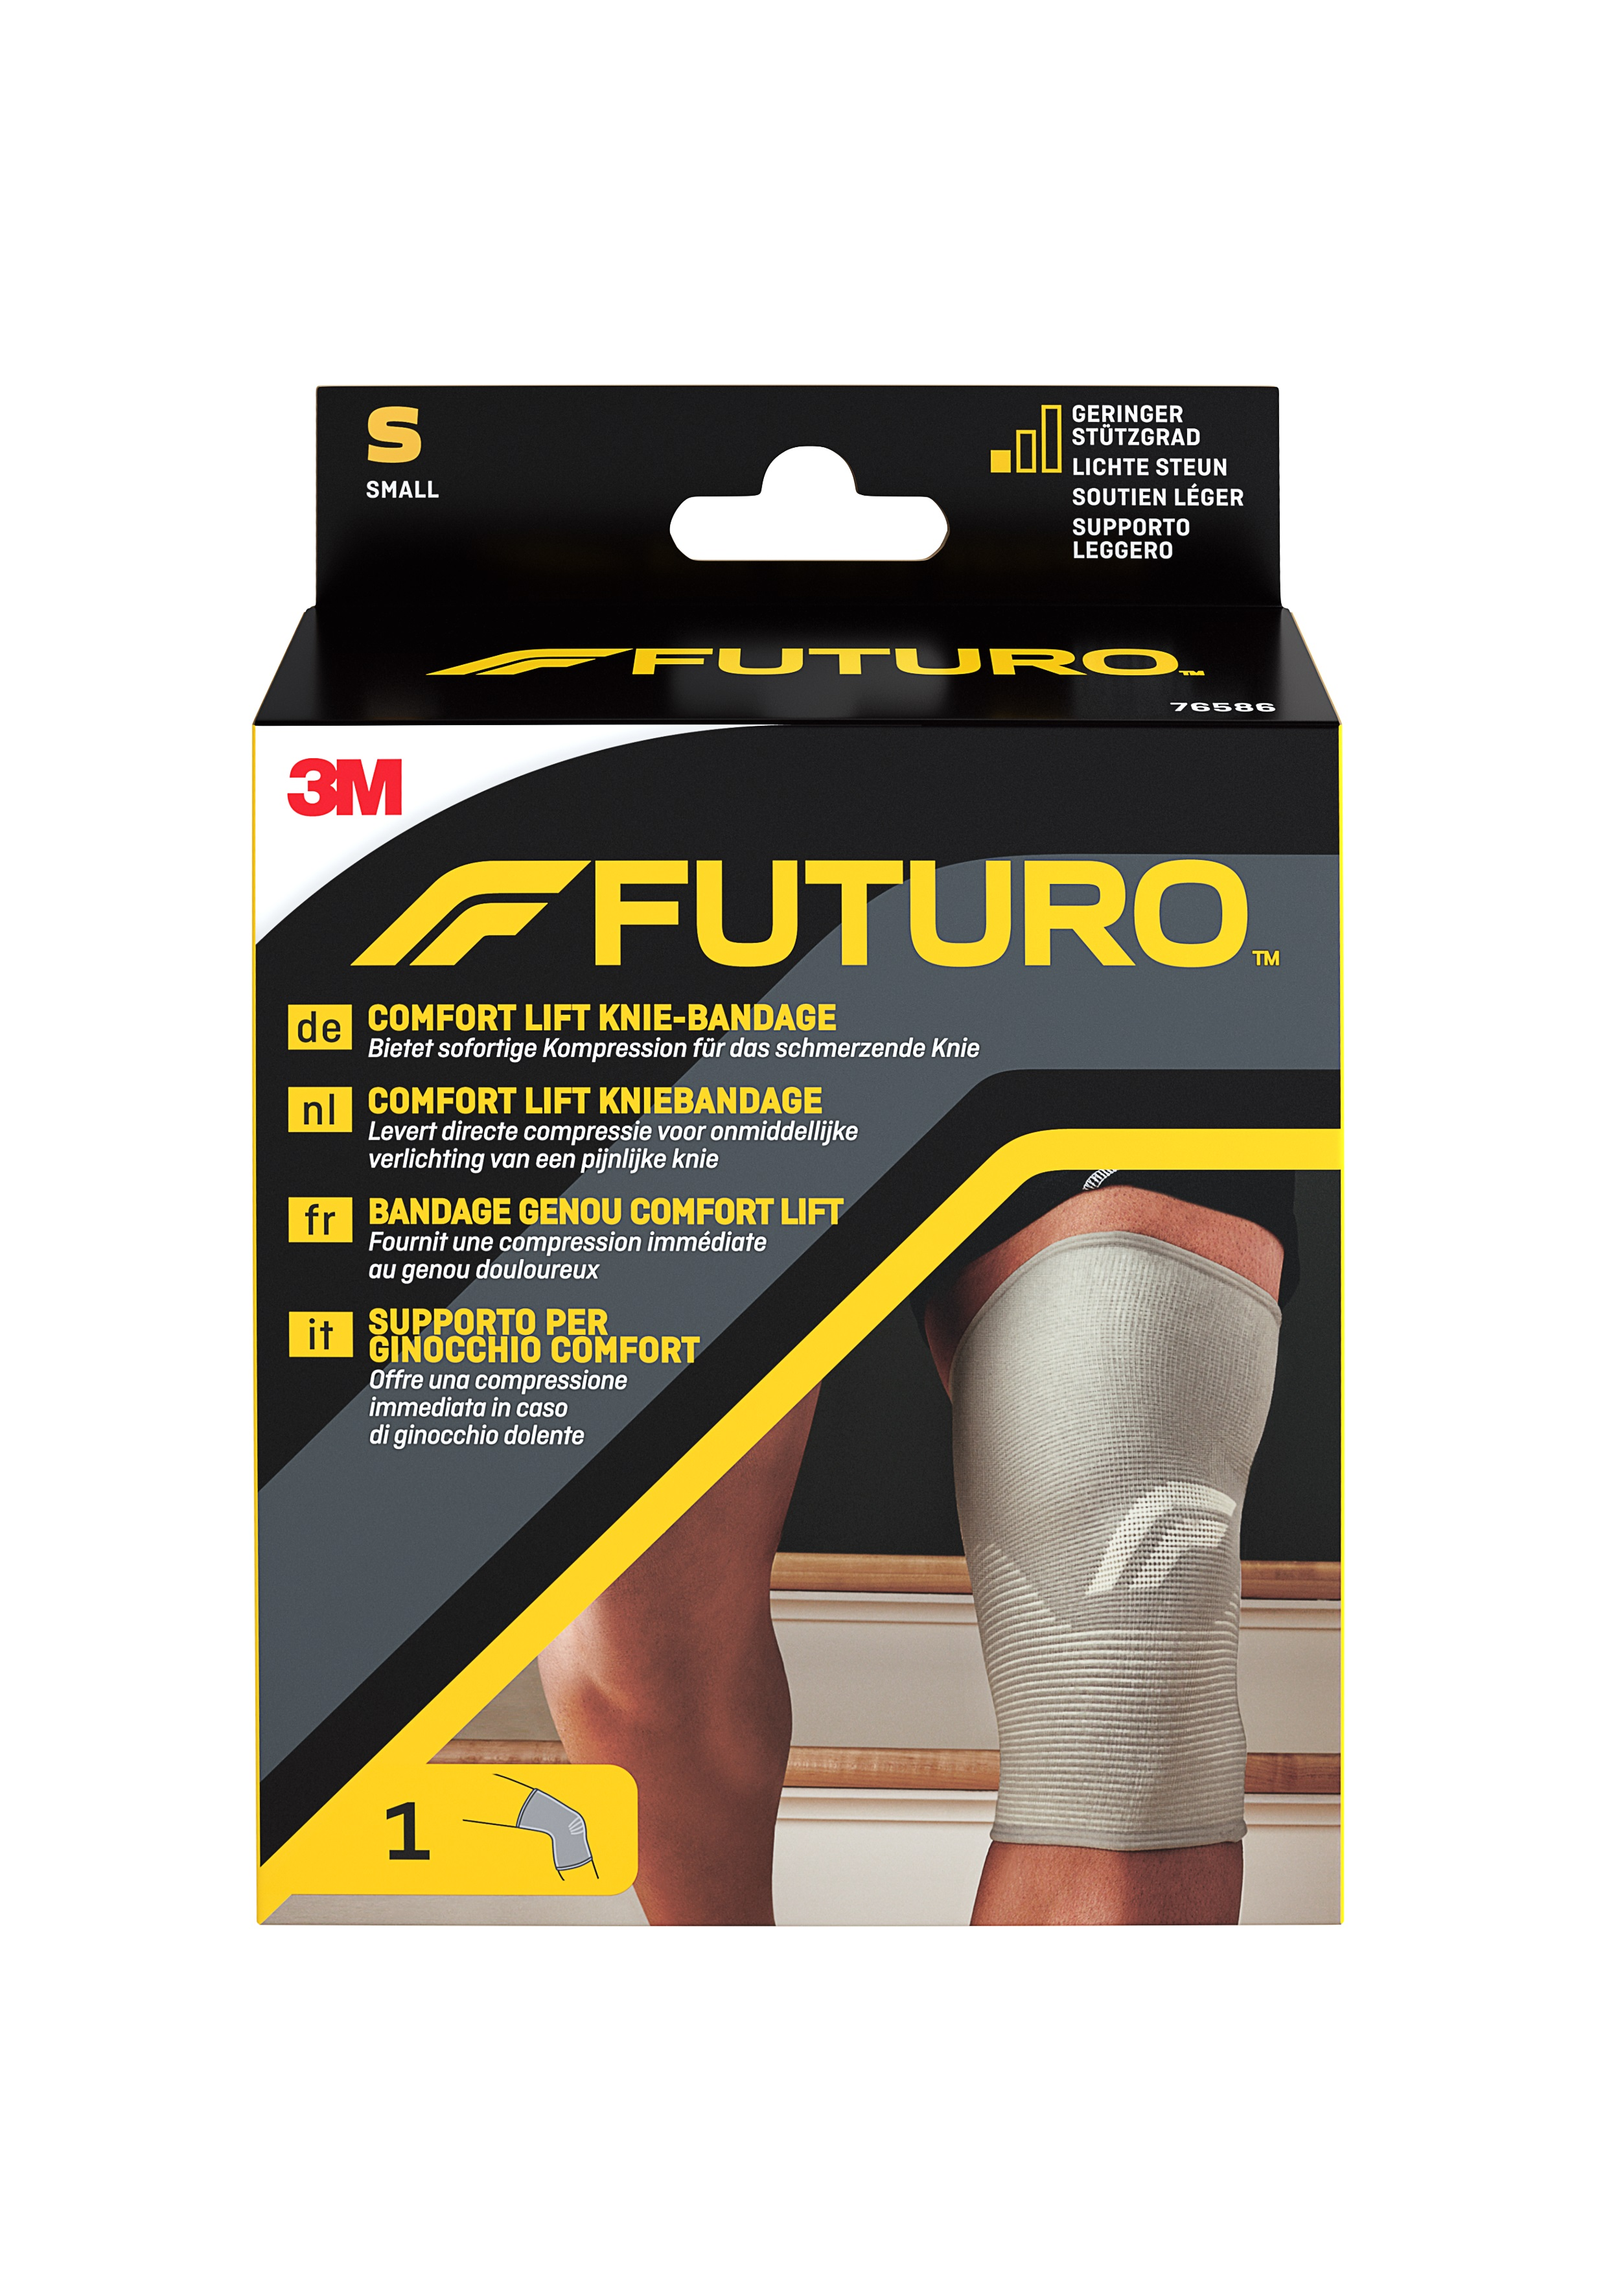 FUTURO™ Comfort Lift Knie-Bandage